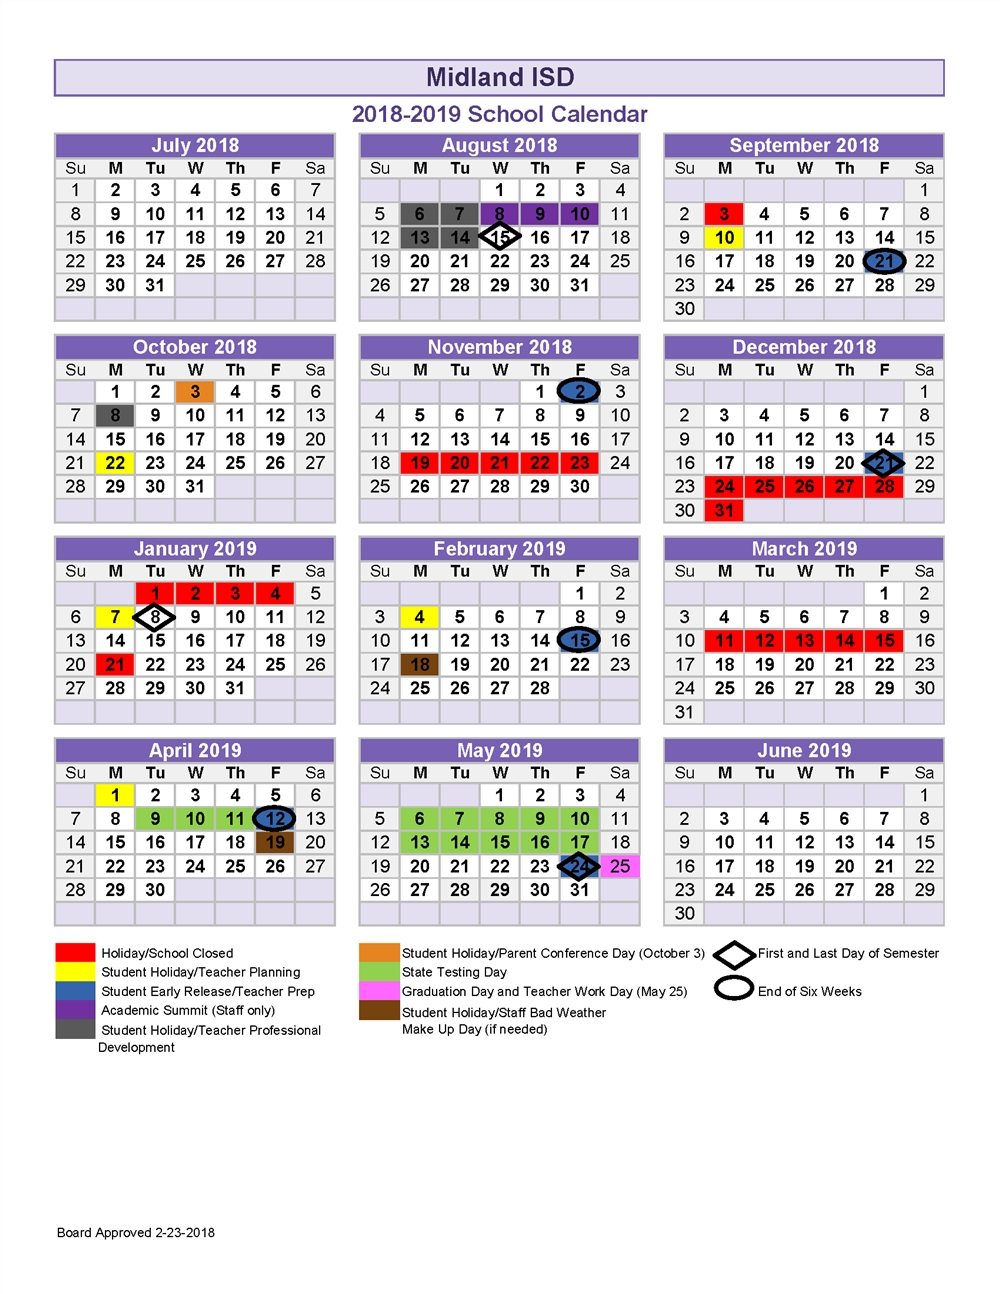 Lee County School Calendar 2020 17 | Exam Calendar With Regard To Boyertown School District Calendar 2020 17